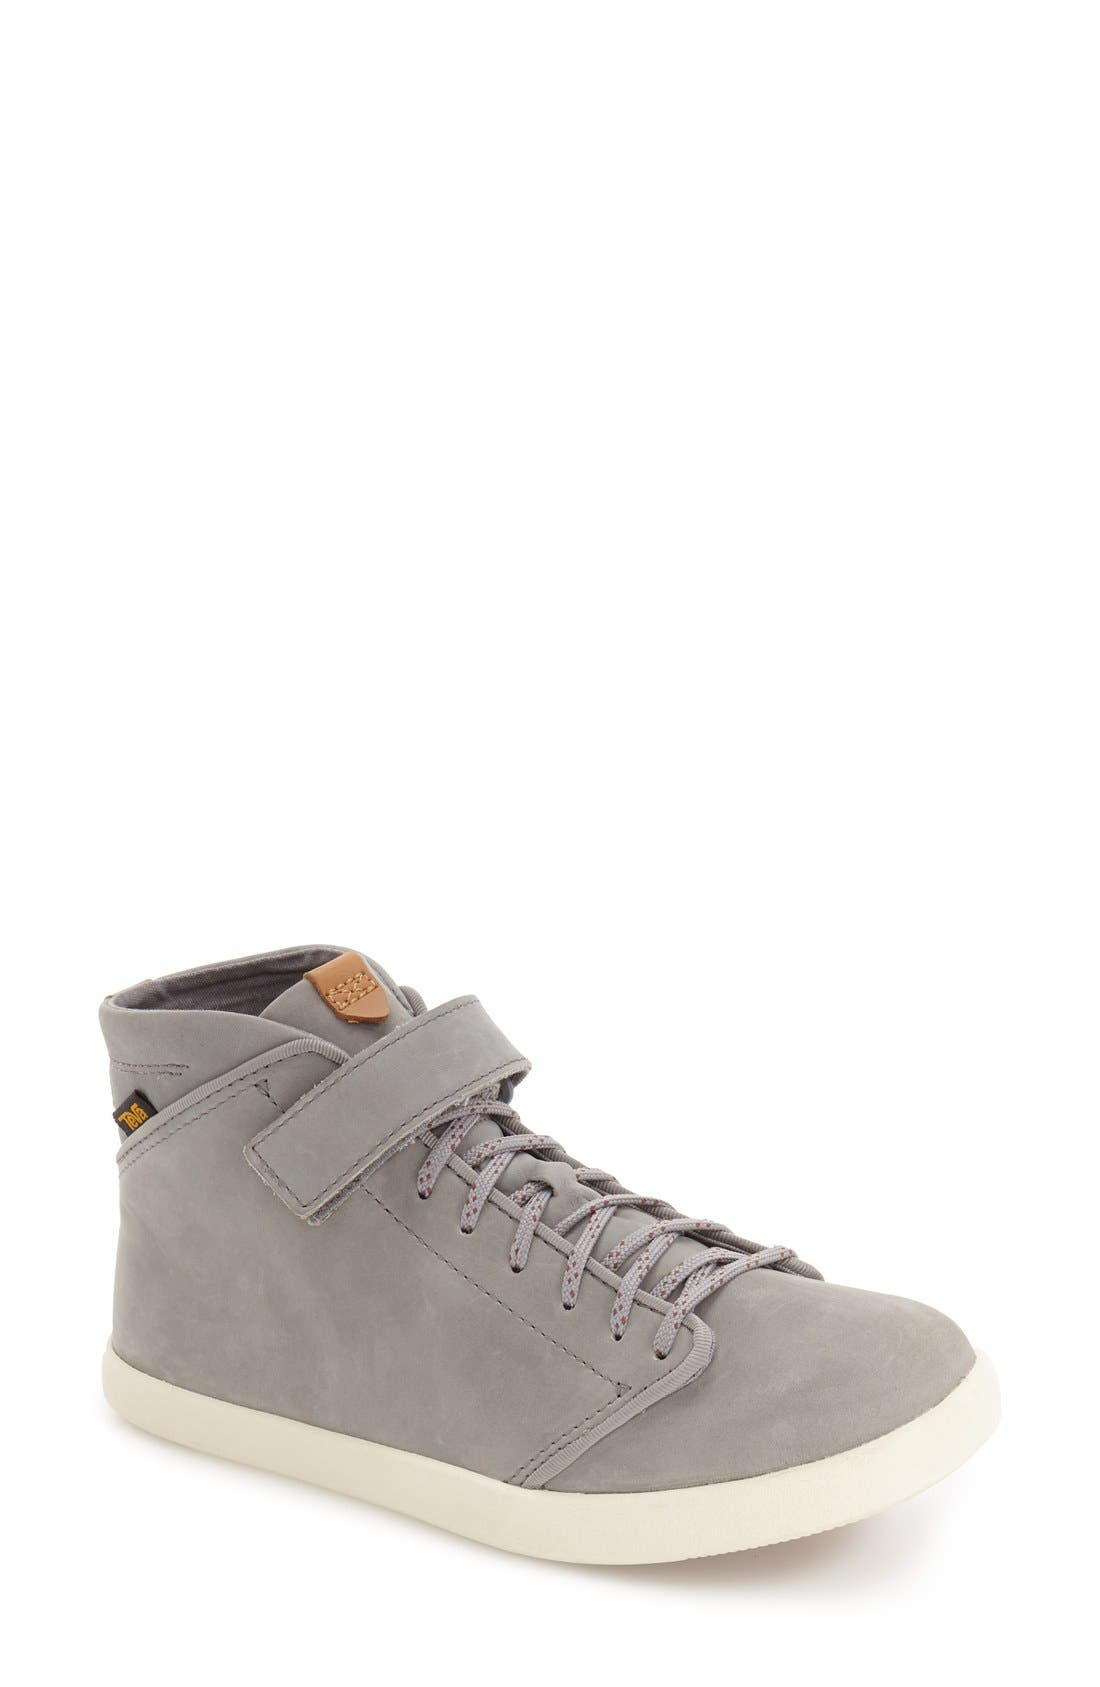 Teva 'Willow' Midi Lace-Up Sneaker (Women)